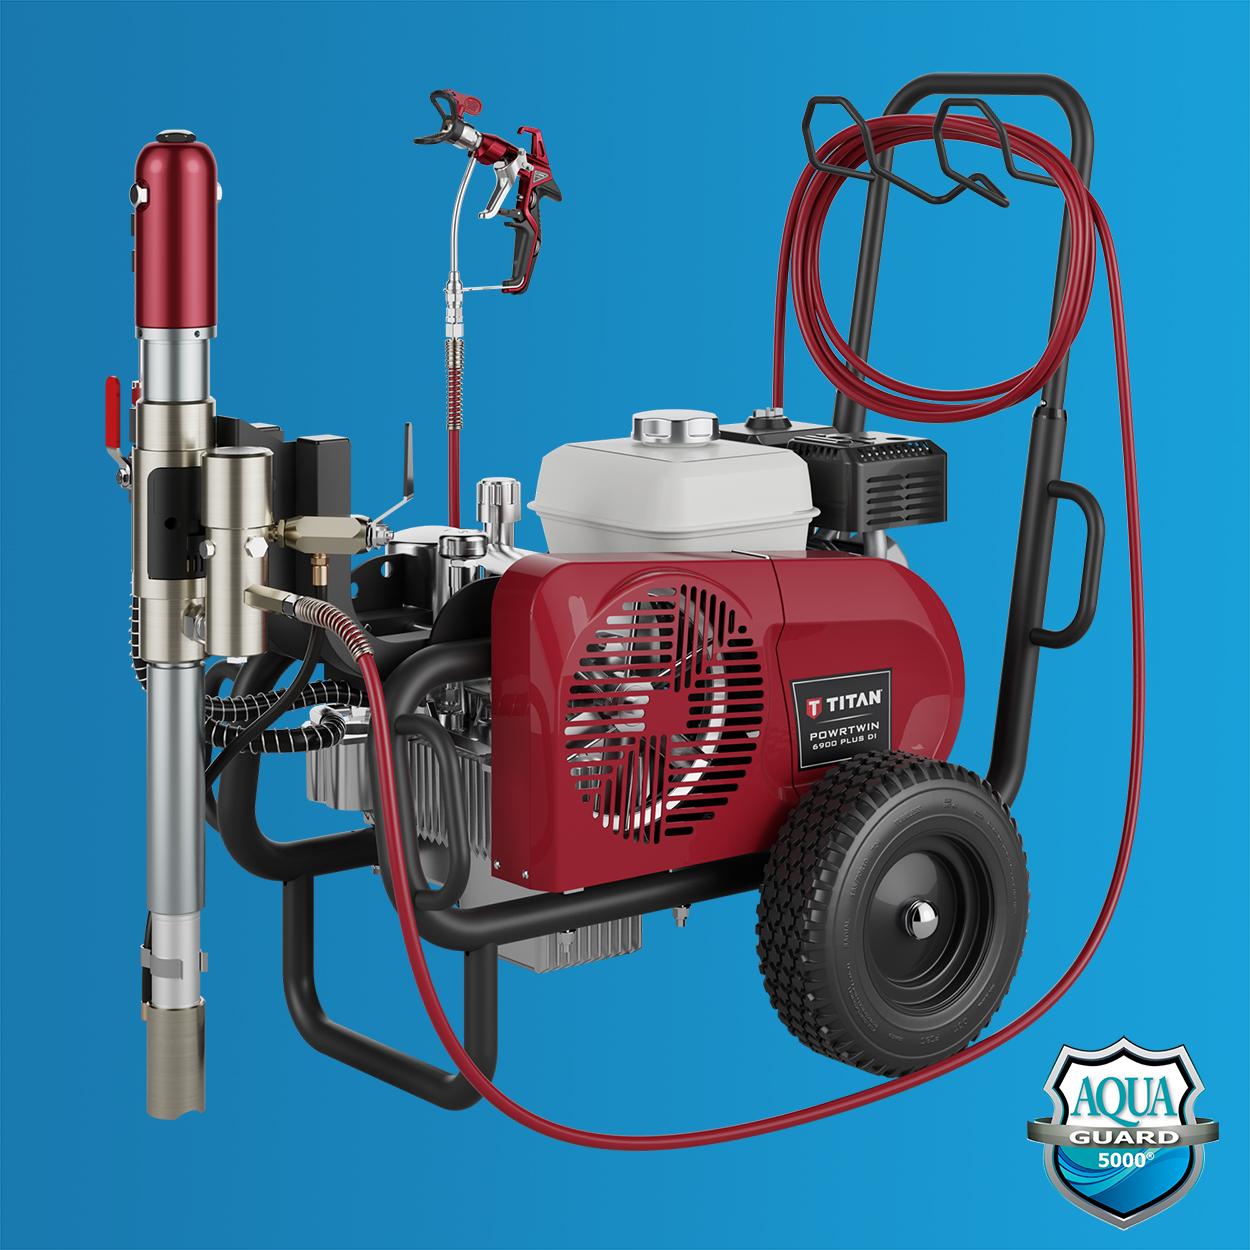 Titan Speeflo PowrTwin 6900XLT DI - Heavy Material Spraying System